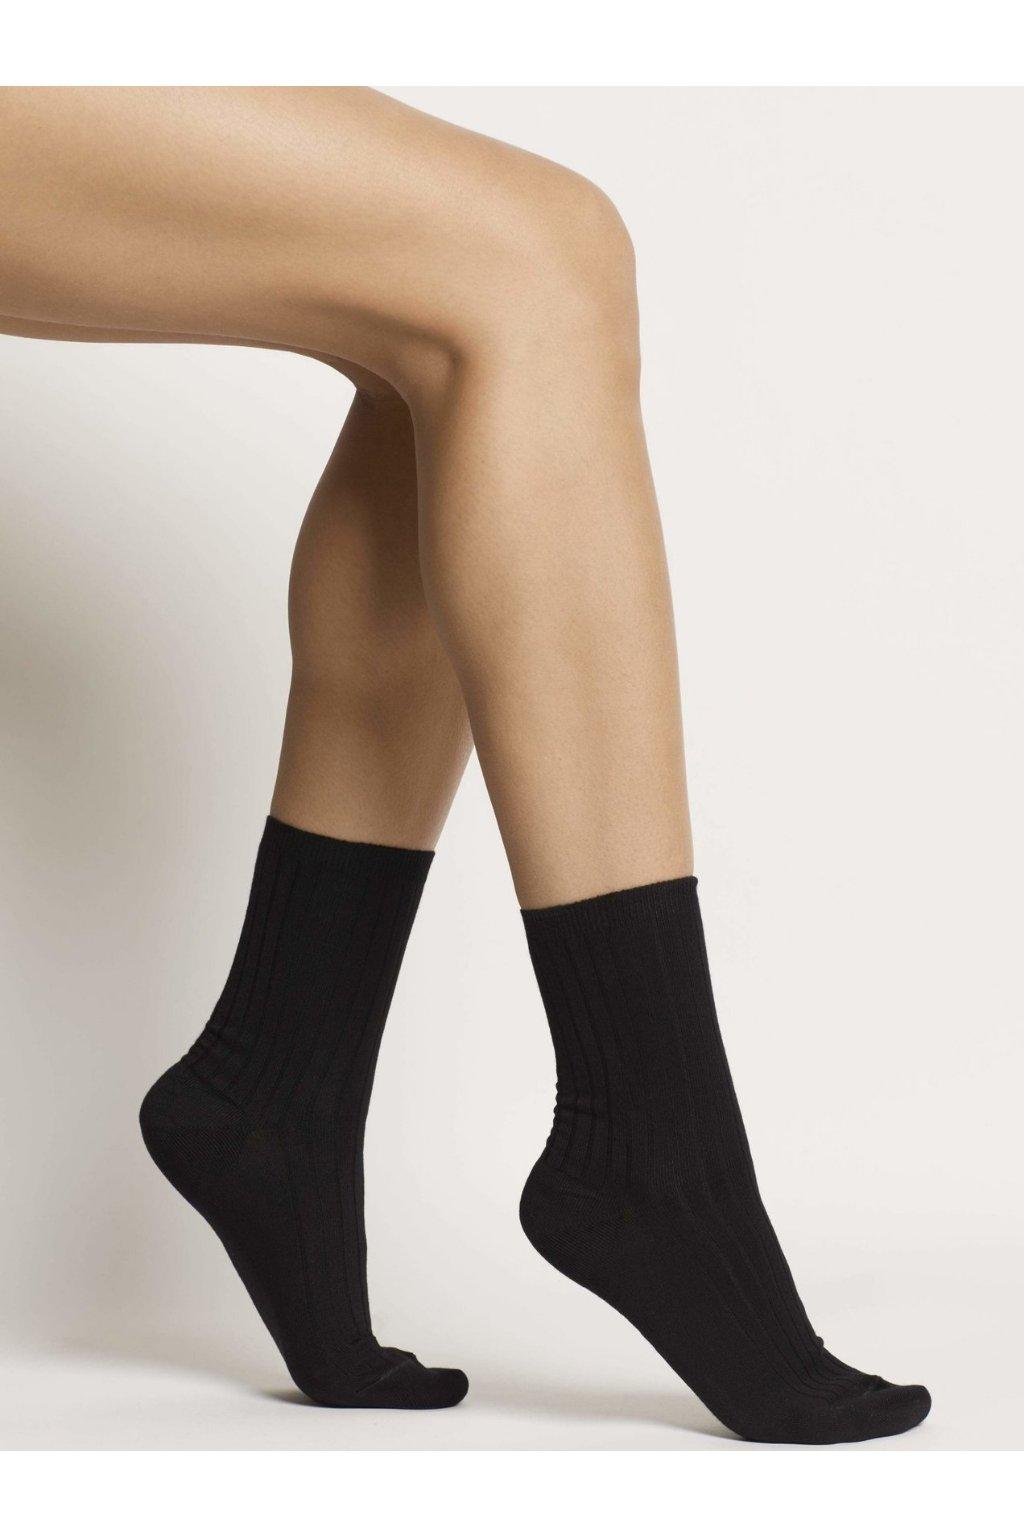 ORGANIC COTTON SOCKS - BLACK